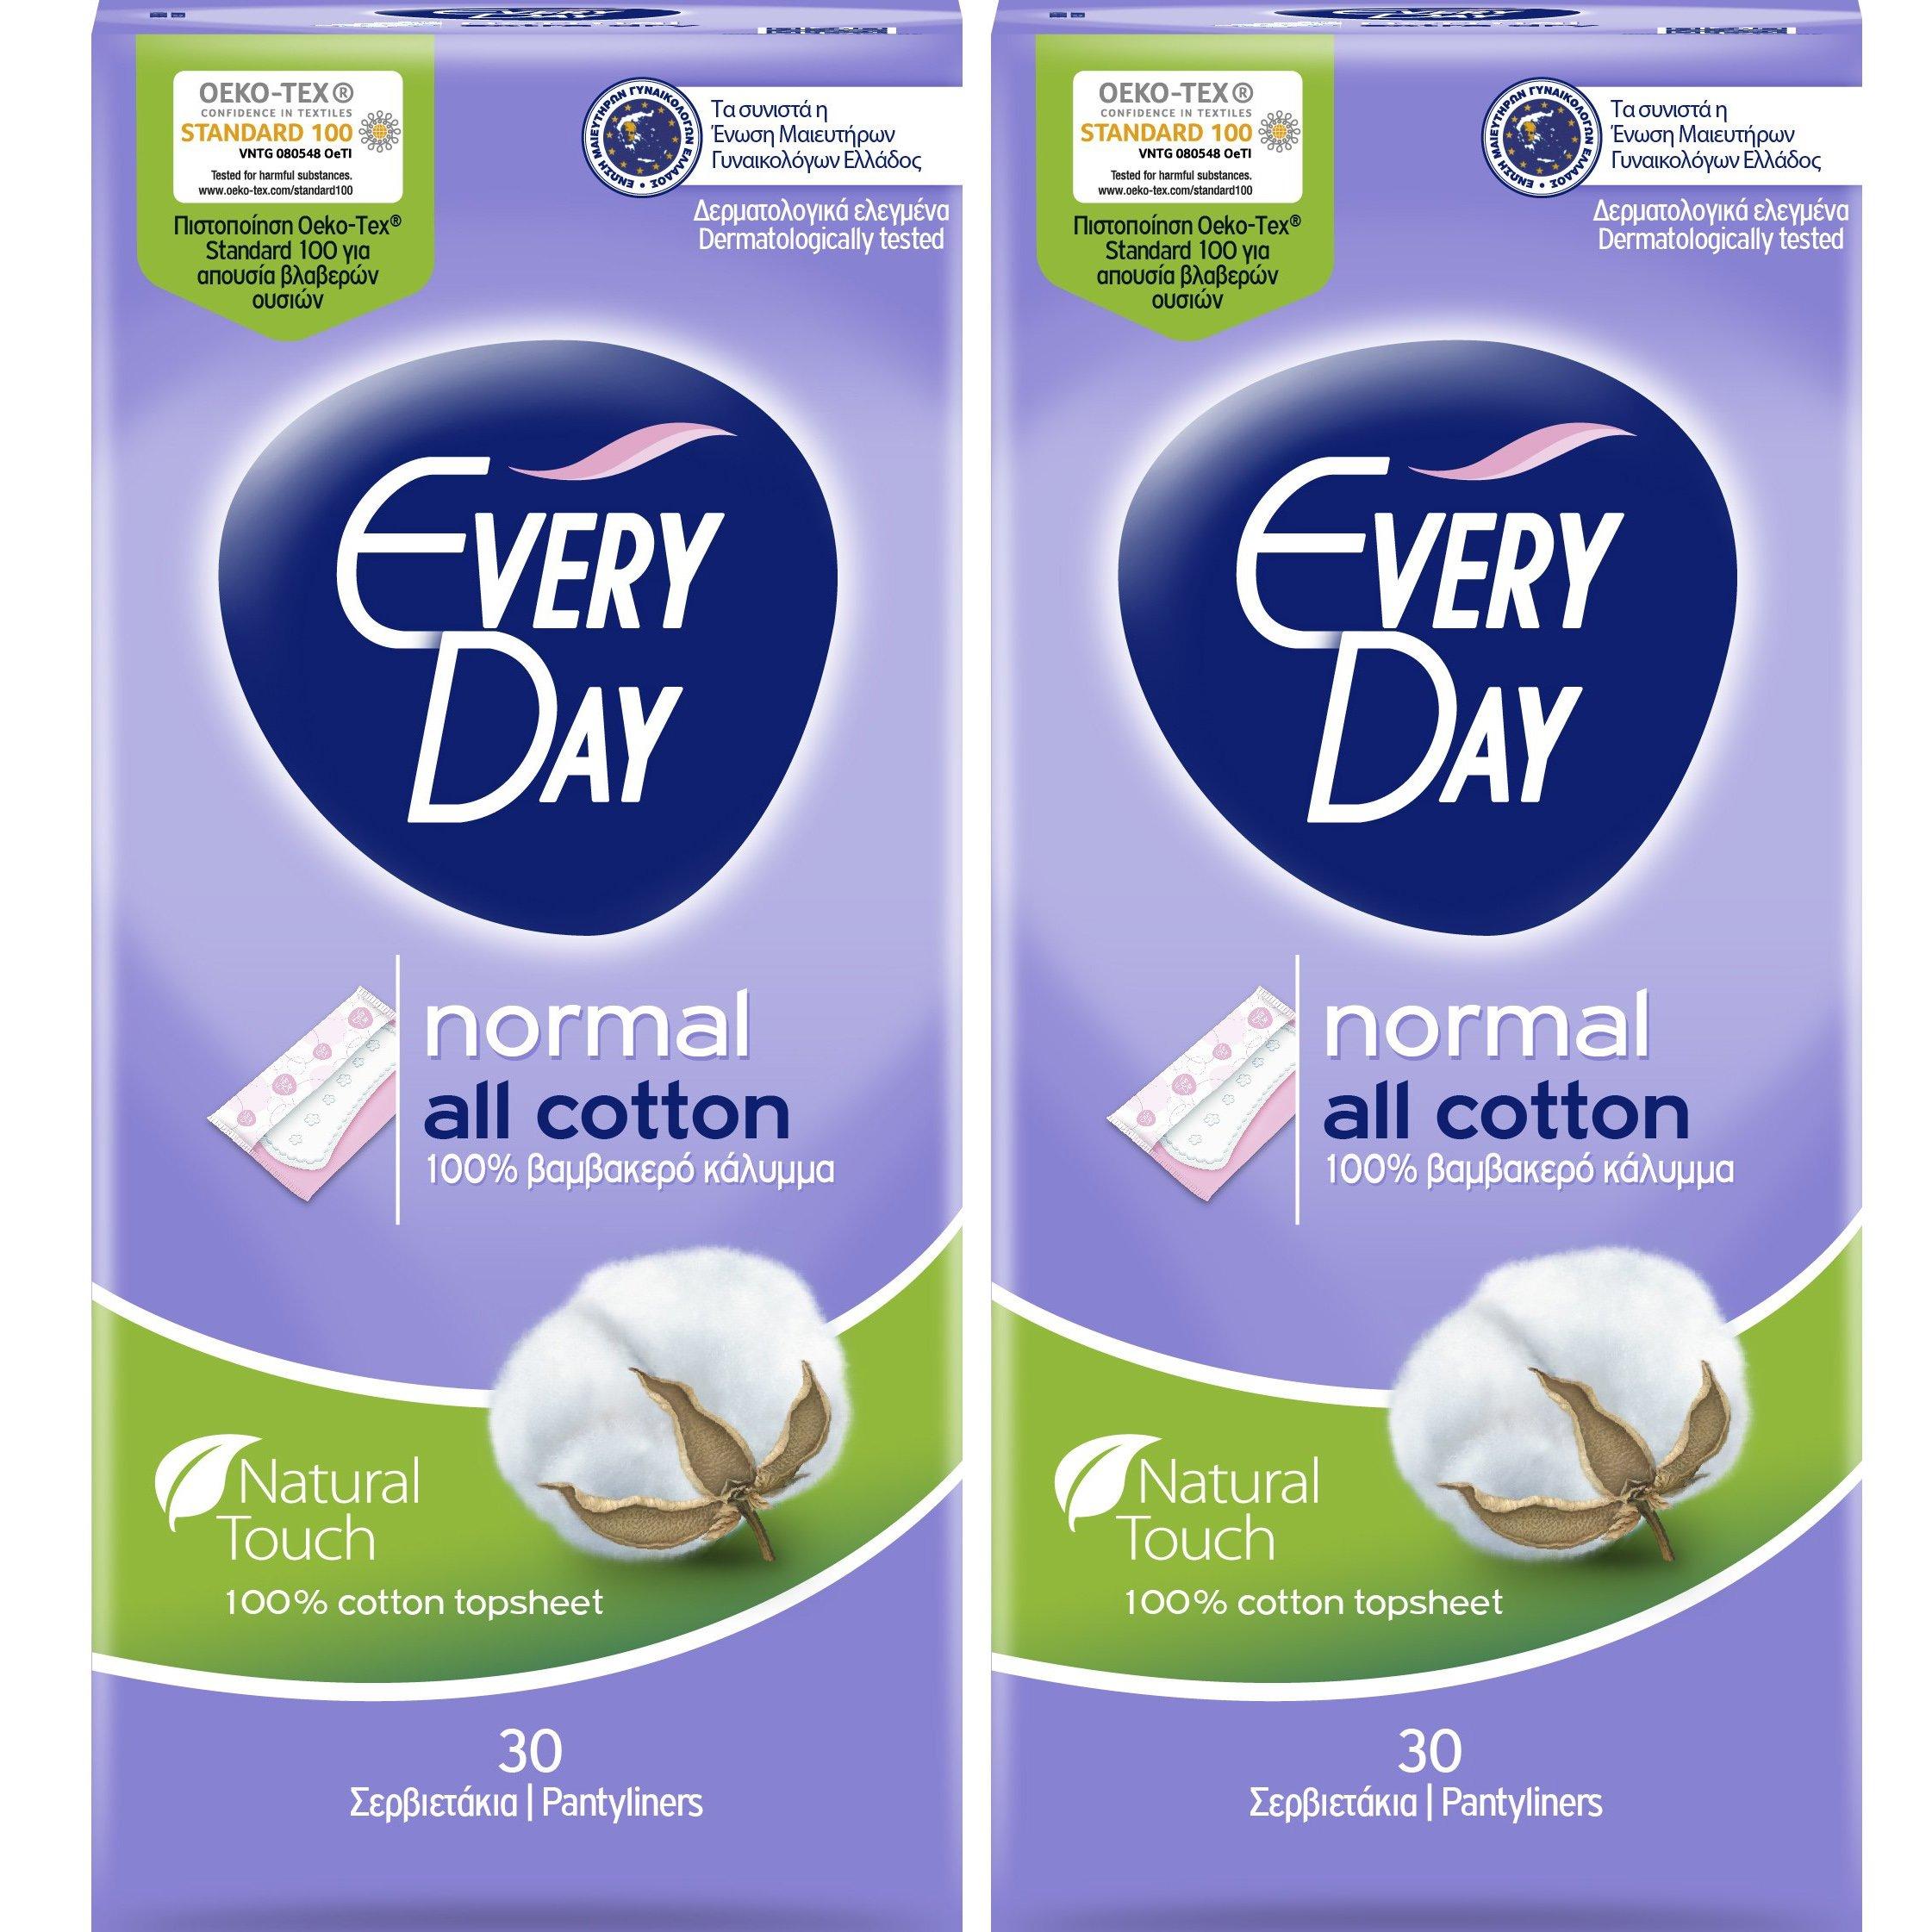 Every Day Πακέτο Προσφοράς All Cotton Normal Ανατομικά Σερβιετάκια με Βαμβακερό Κάλυμμα 2×30 Τεμάχια 1+1 Δώρο